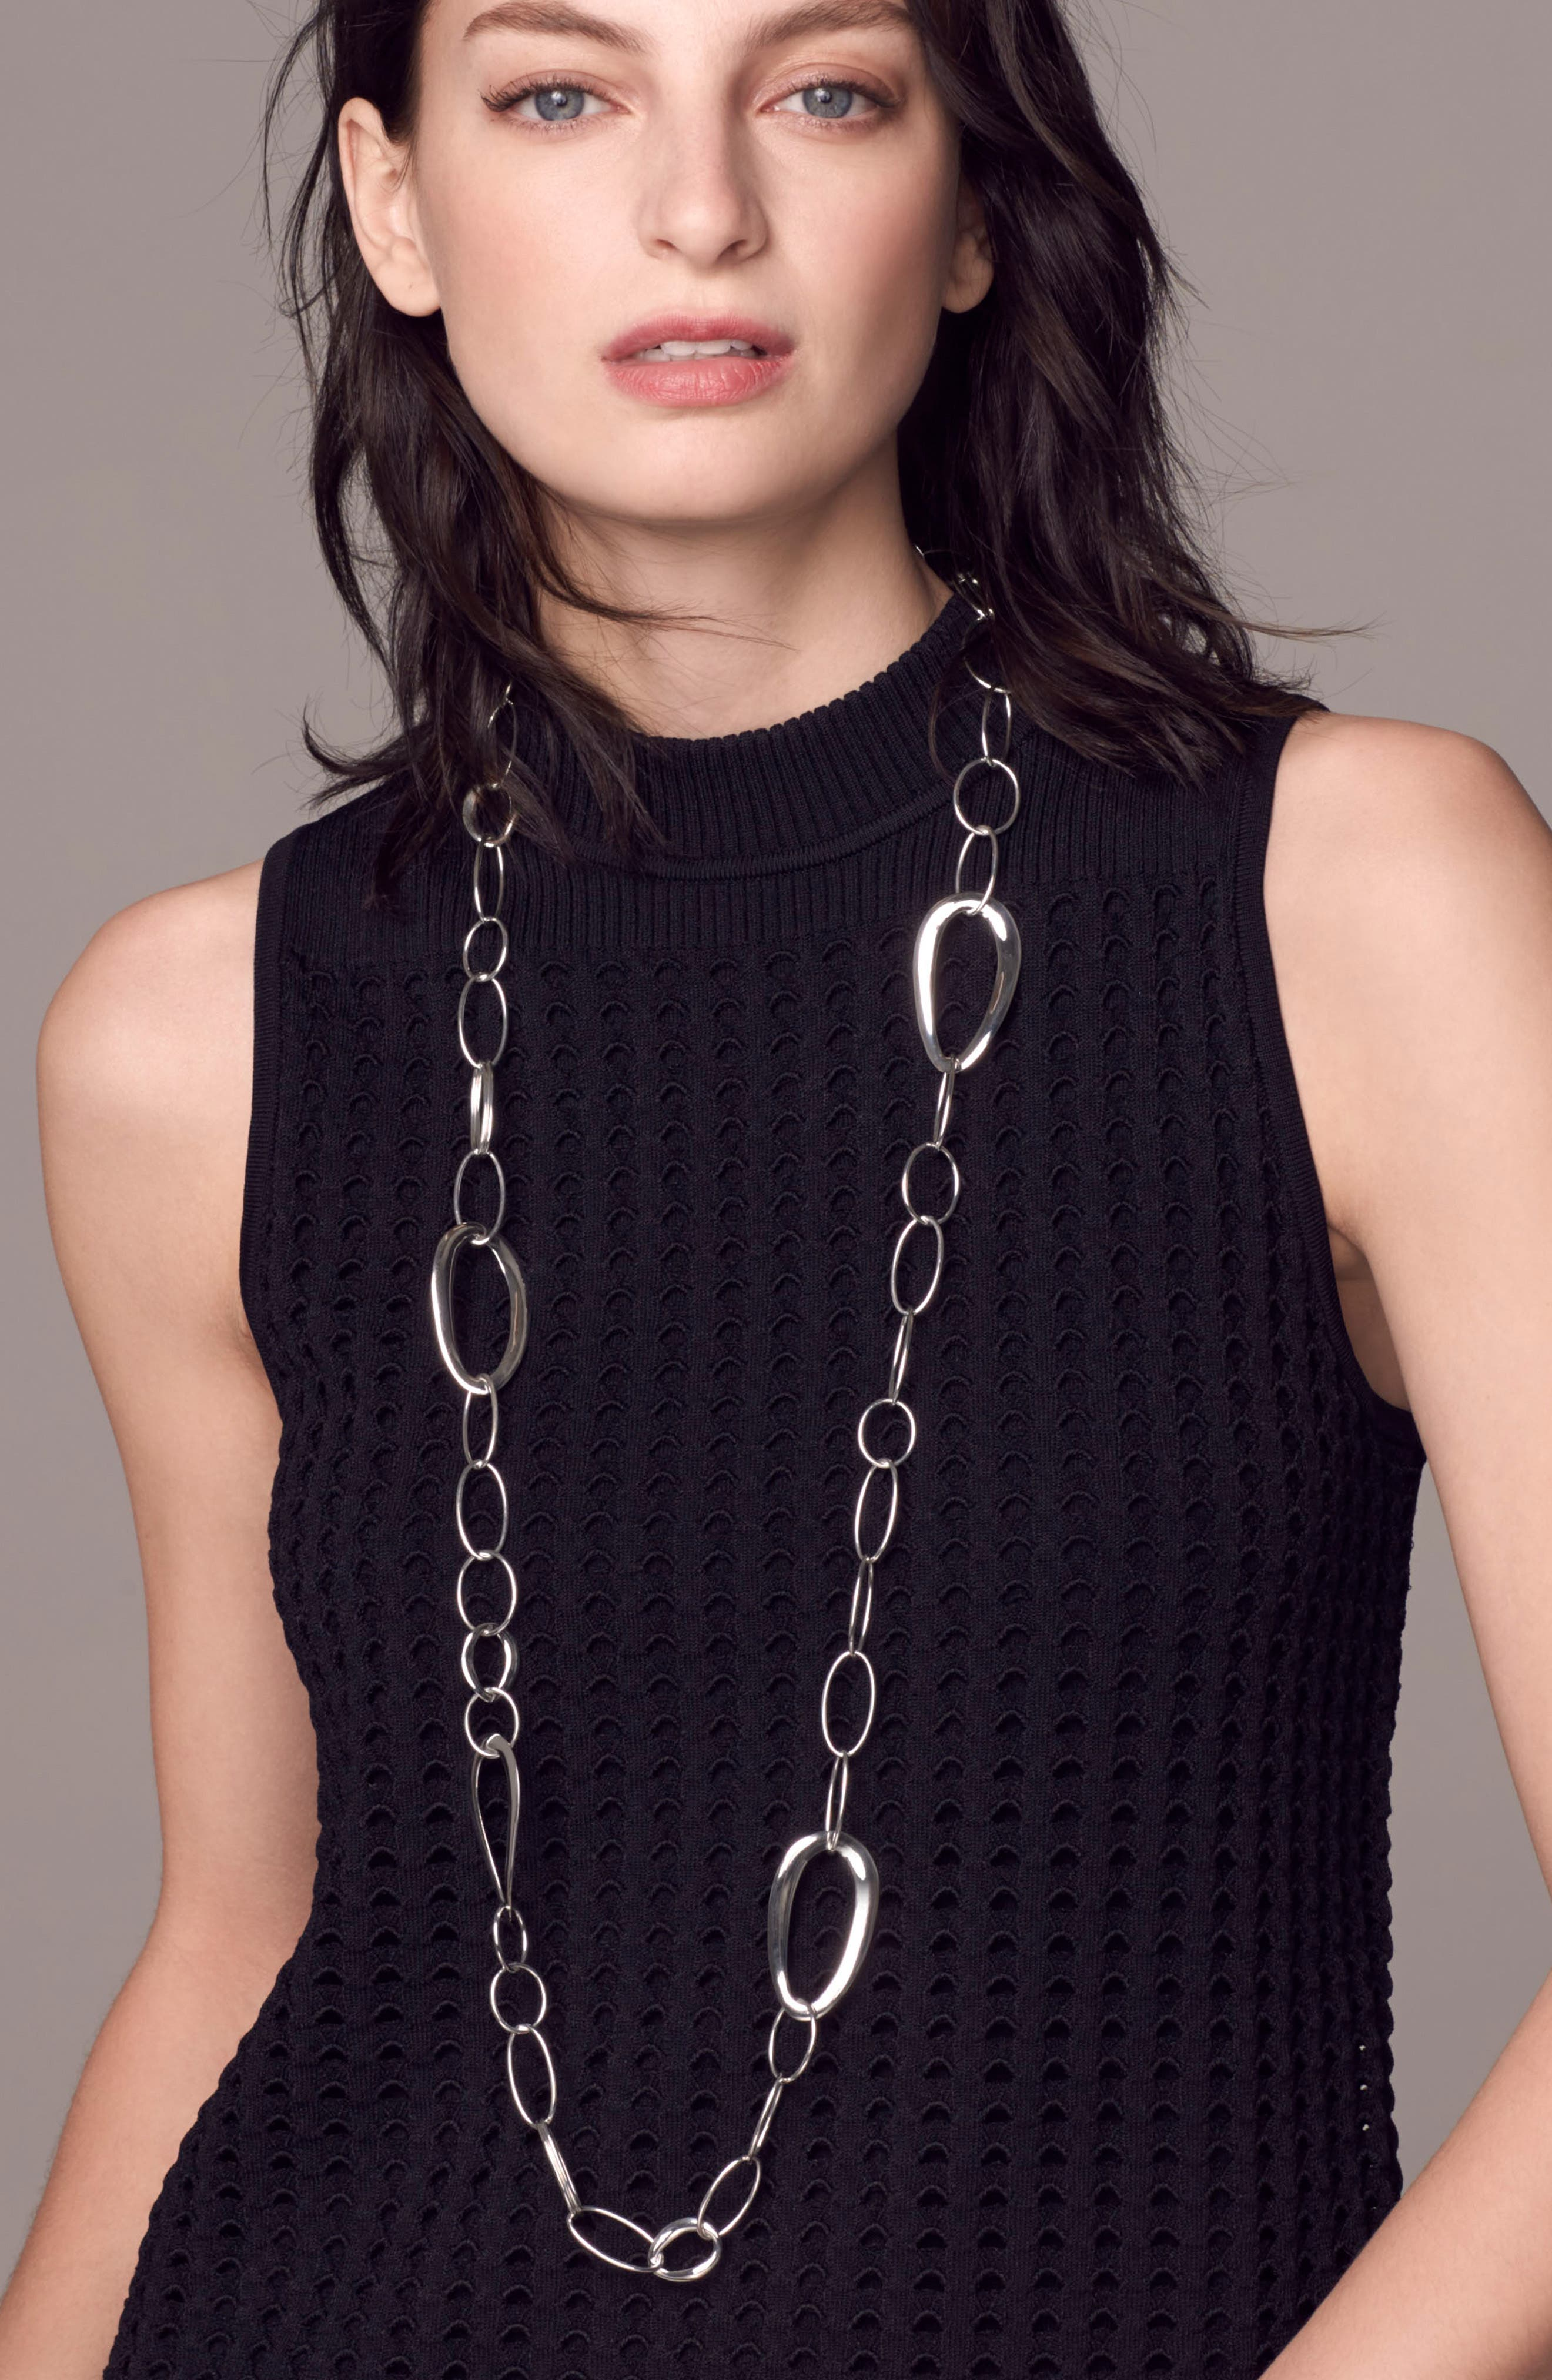 'Cherish' Wavy Oval Chain Necklace,                             Alternate thumbnail 2, color,                             040